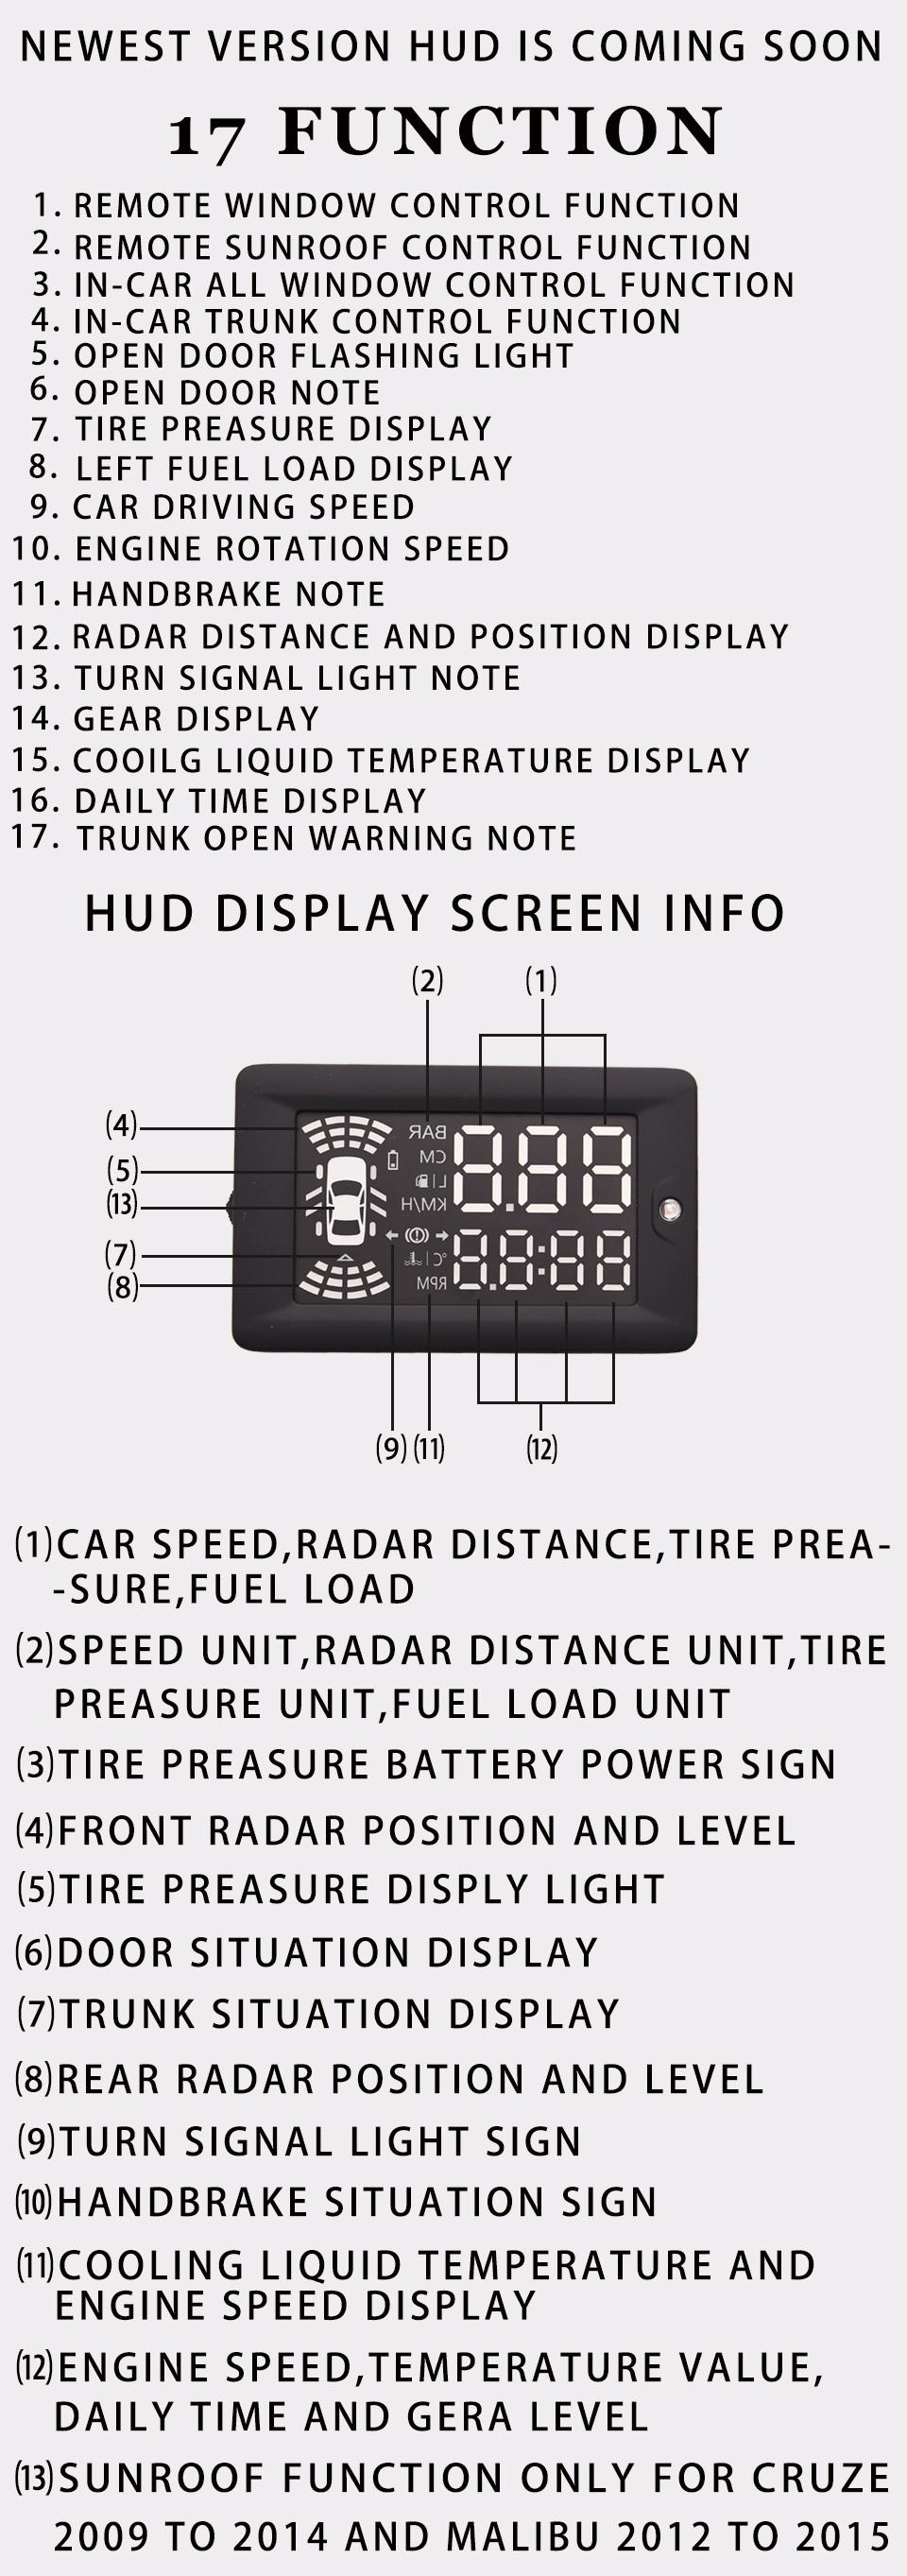 KUST NEWEST Car HUD Head Up Display For Chevrolet HUD For Cruze HUD OBD2 Display For CRUZE 2009 To 2014 For Malibu 2012 To 2015